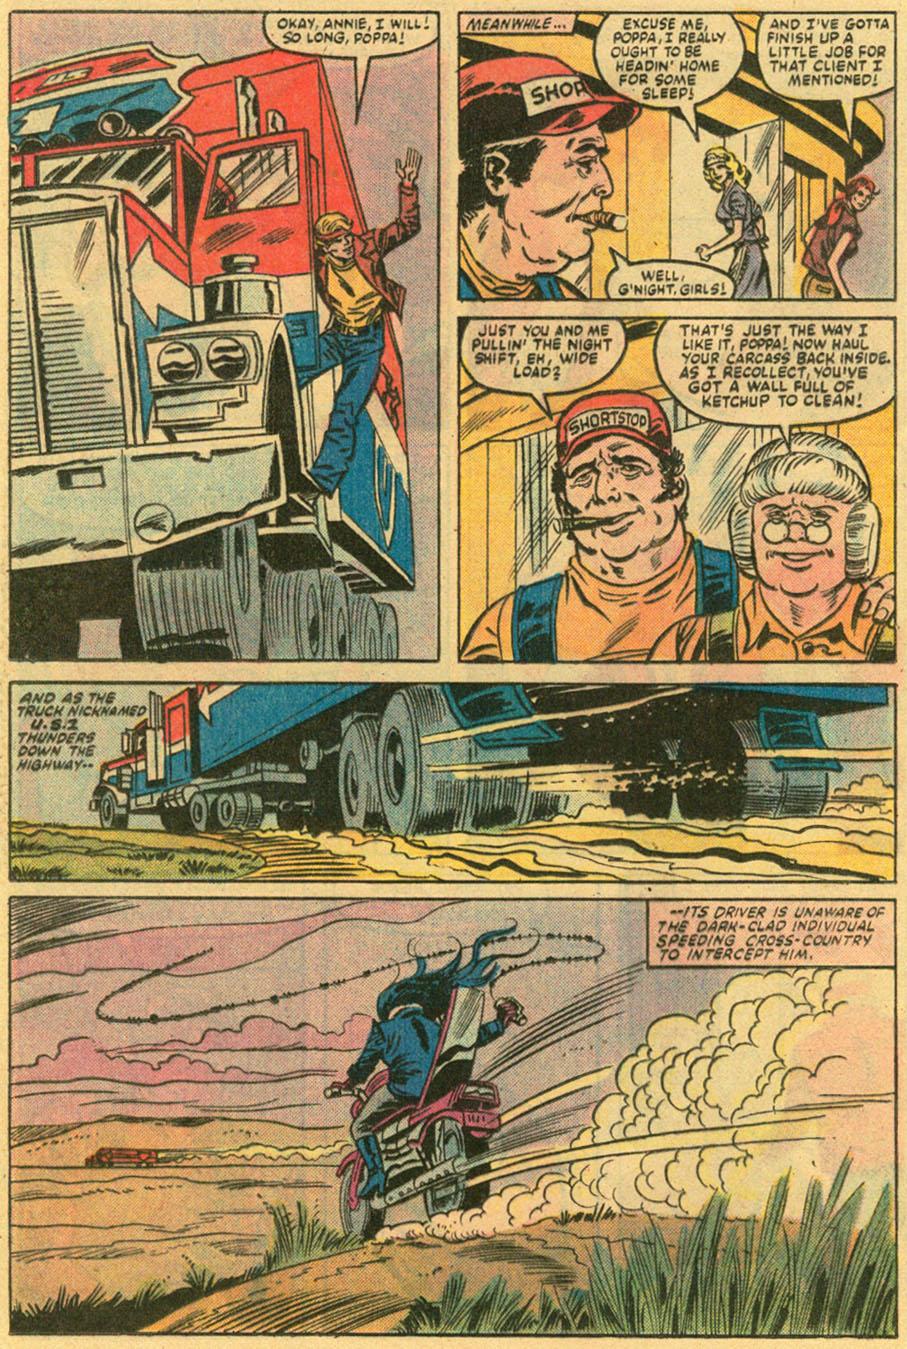 Read online U.S. 1 comic -  Issue #2 - 14